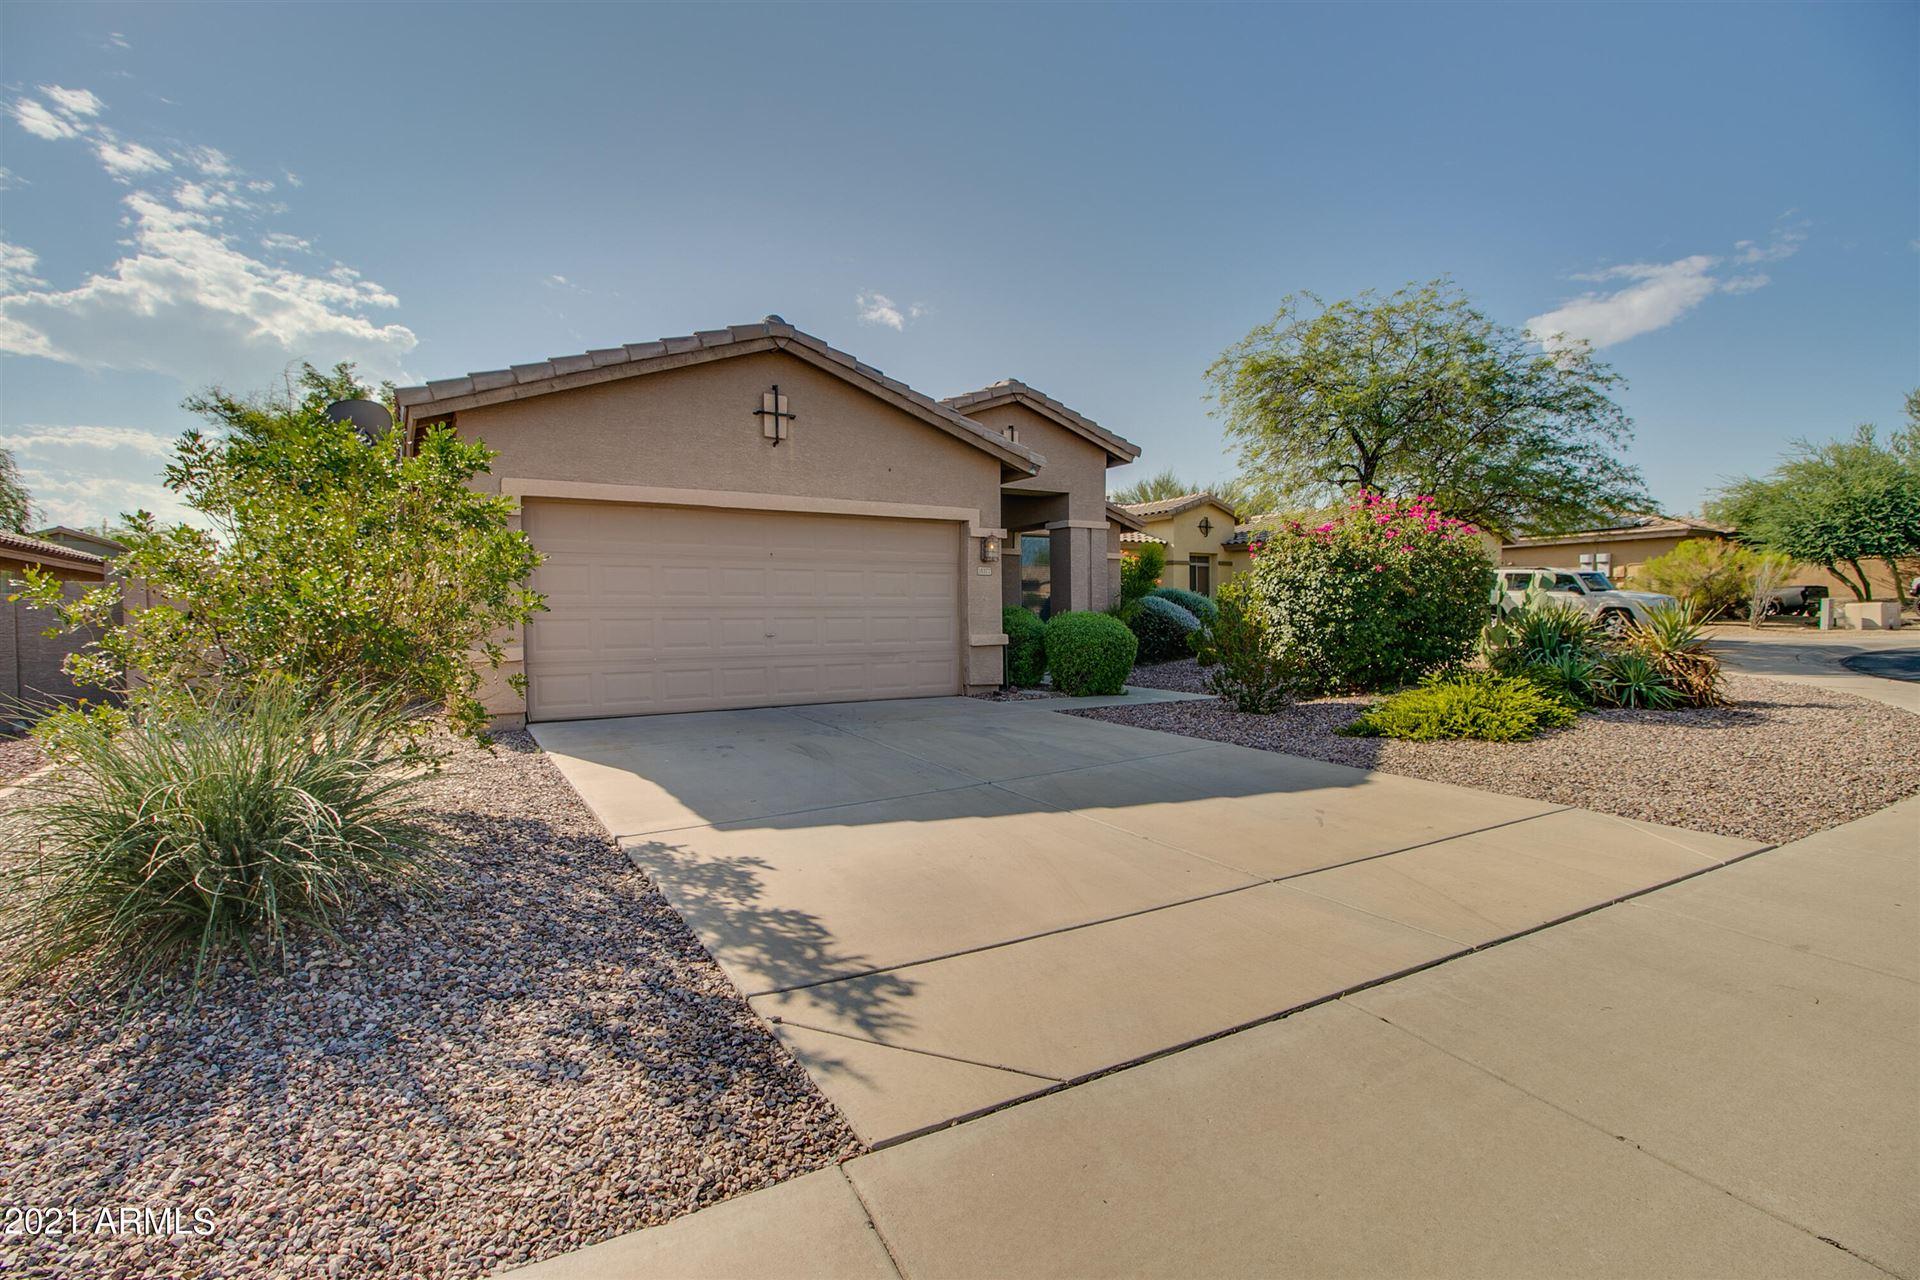 Photo of 18377 W SUNRISE Drive, Goodyear, AZ 85338 (MLS # 6295945)